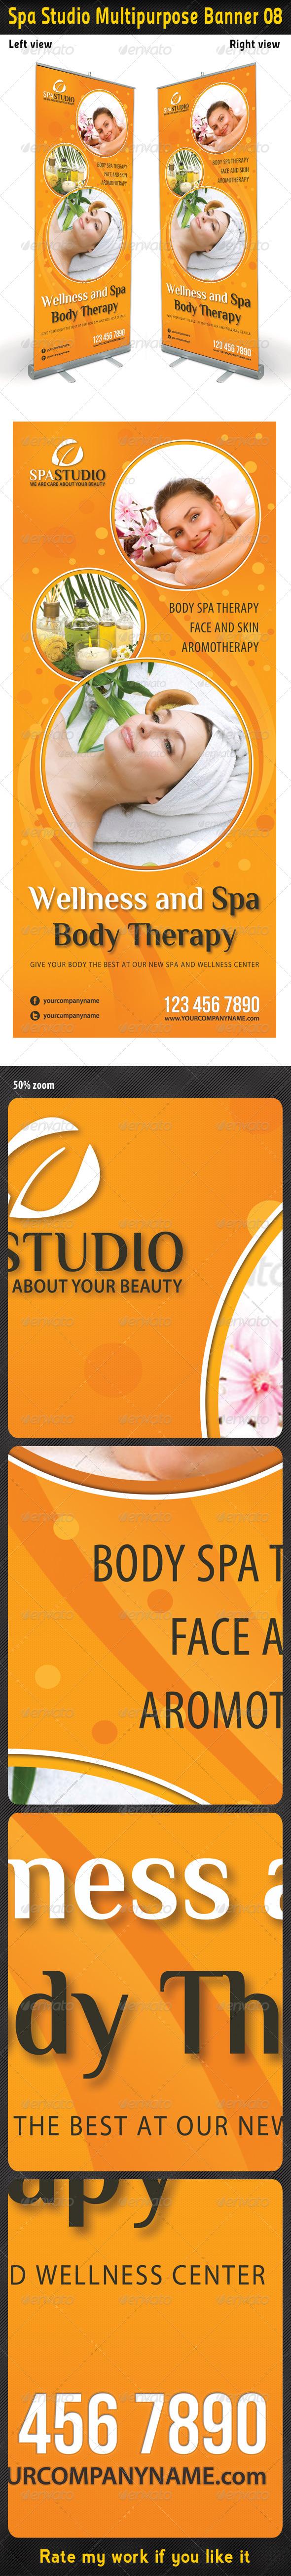 Spa Studio Multipurpose Banner 08 - Signage Print Templates